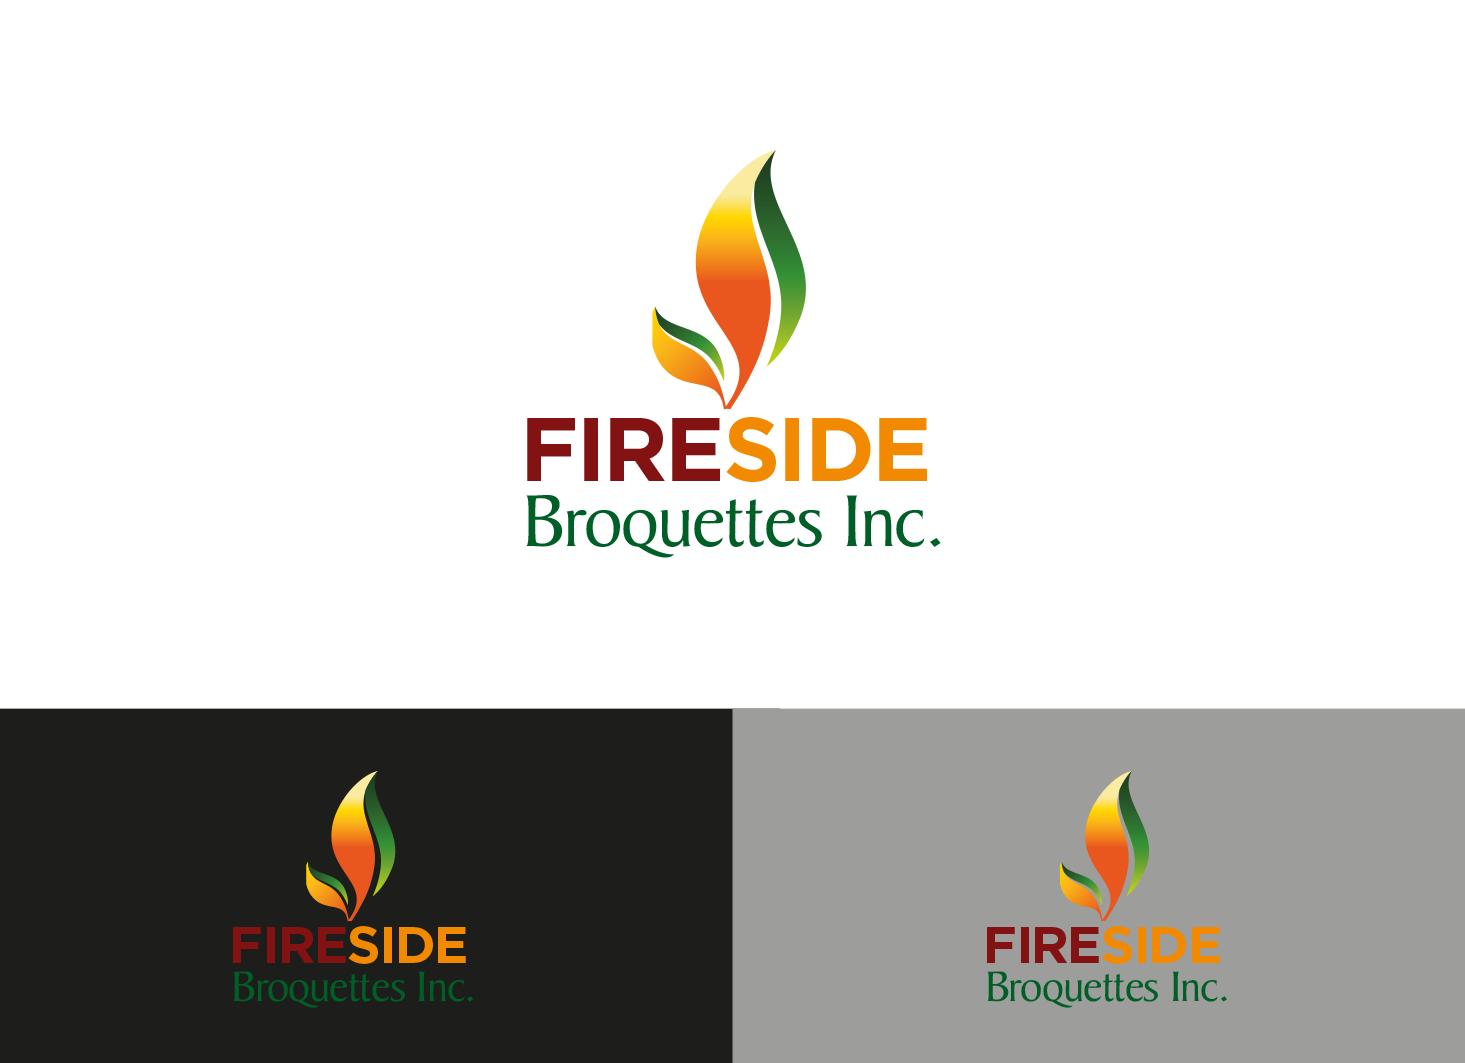 Logo Design by Private User - Entry No. 92 in the Logo Design Contest Fun Logo Design for Fireside Briquettes Inc..